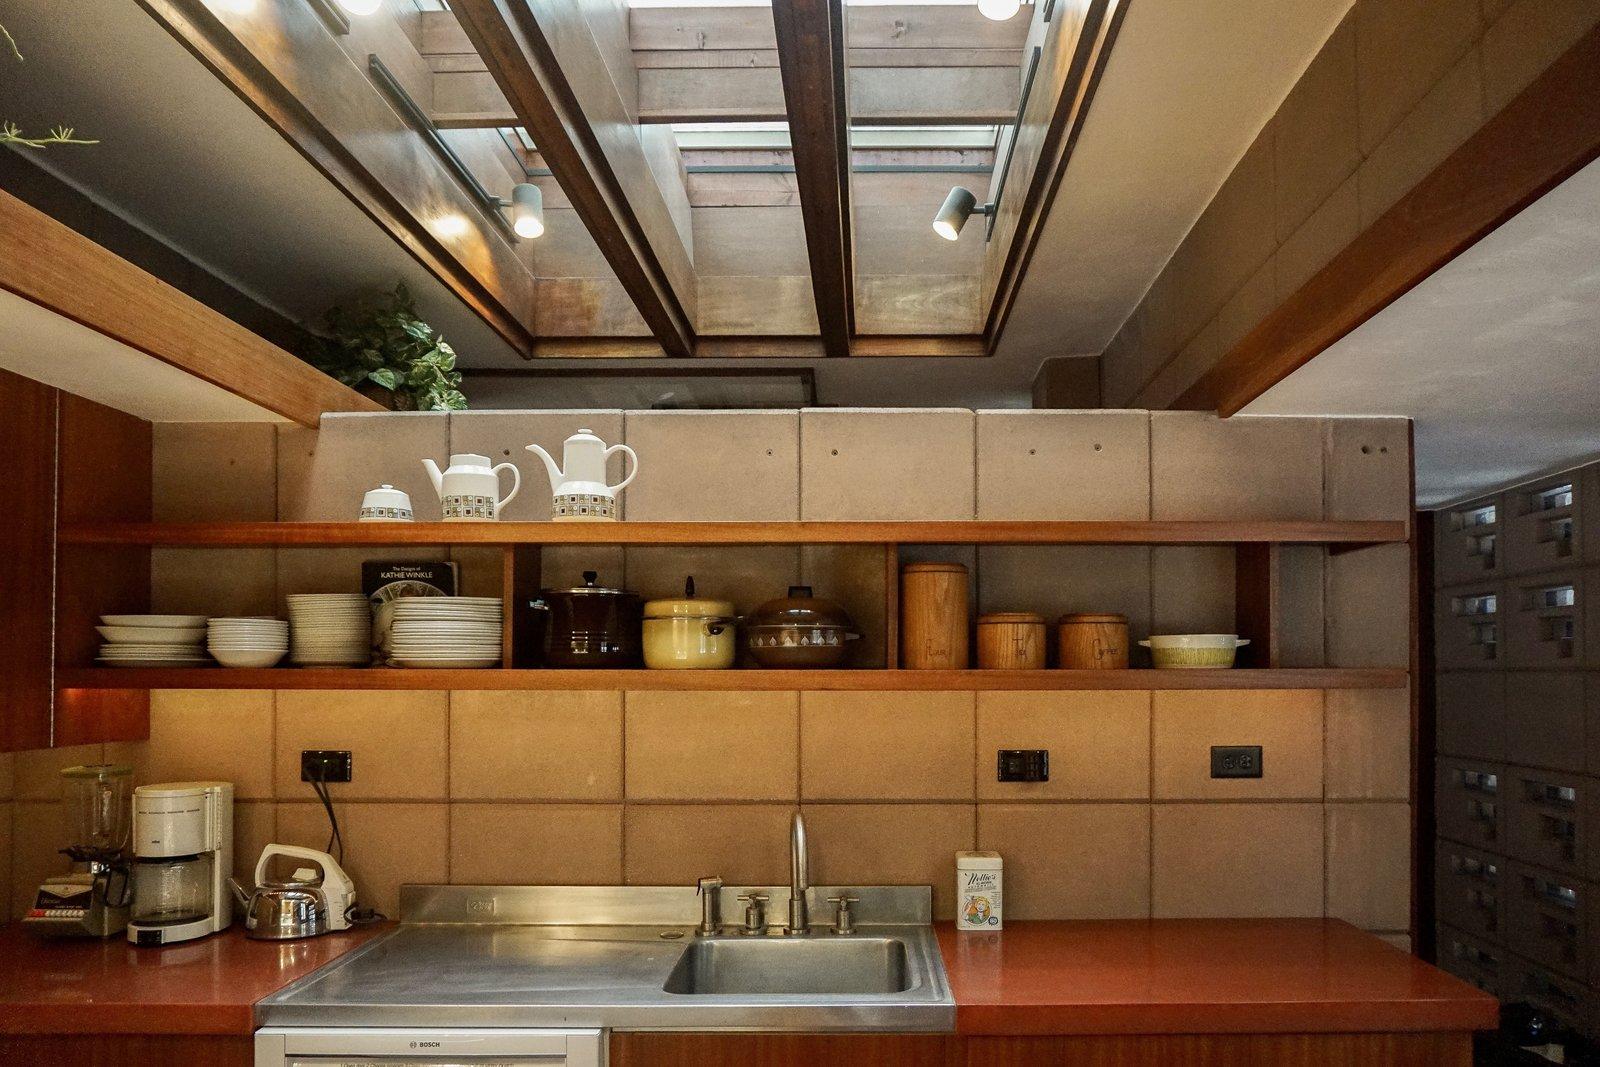 Kitchen, Concrete Backsplashe, Track Lighting, Drop In Sink, And Open  Cabinet Open